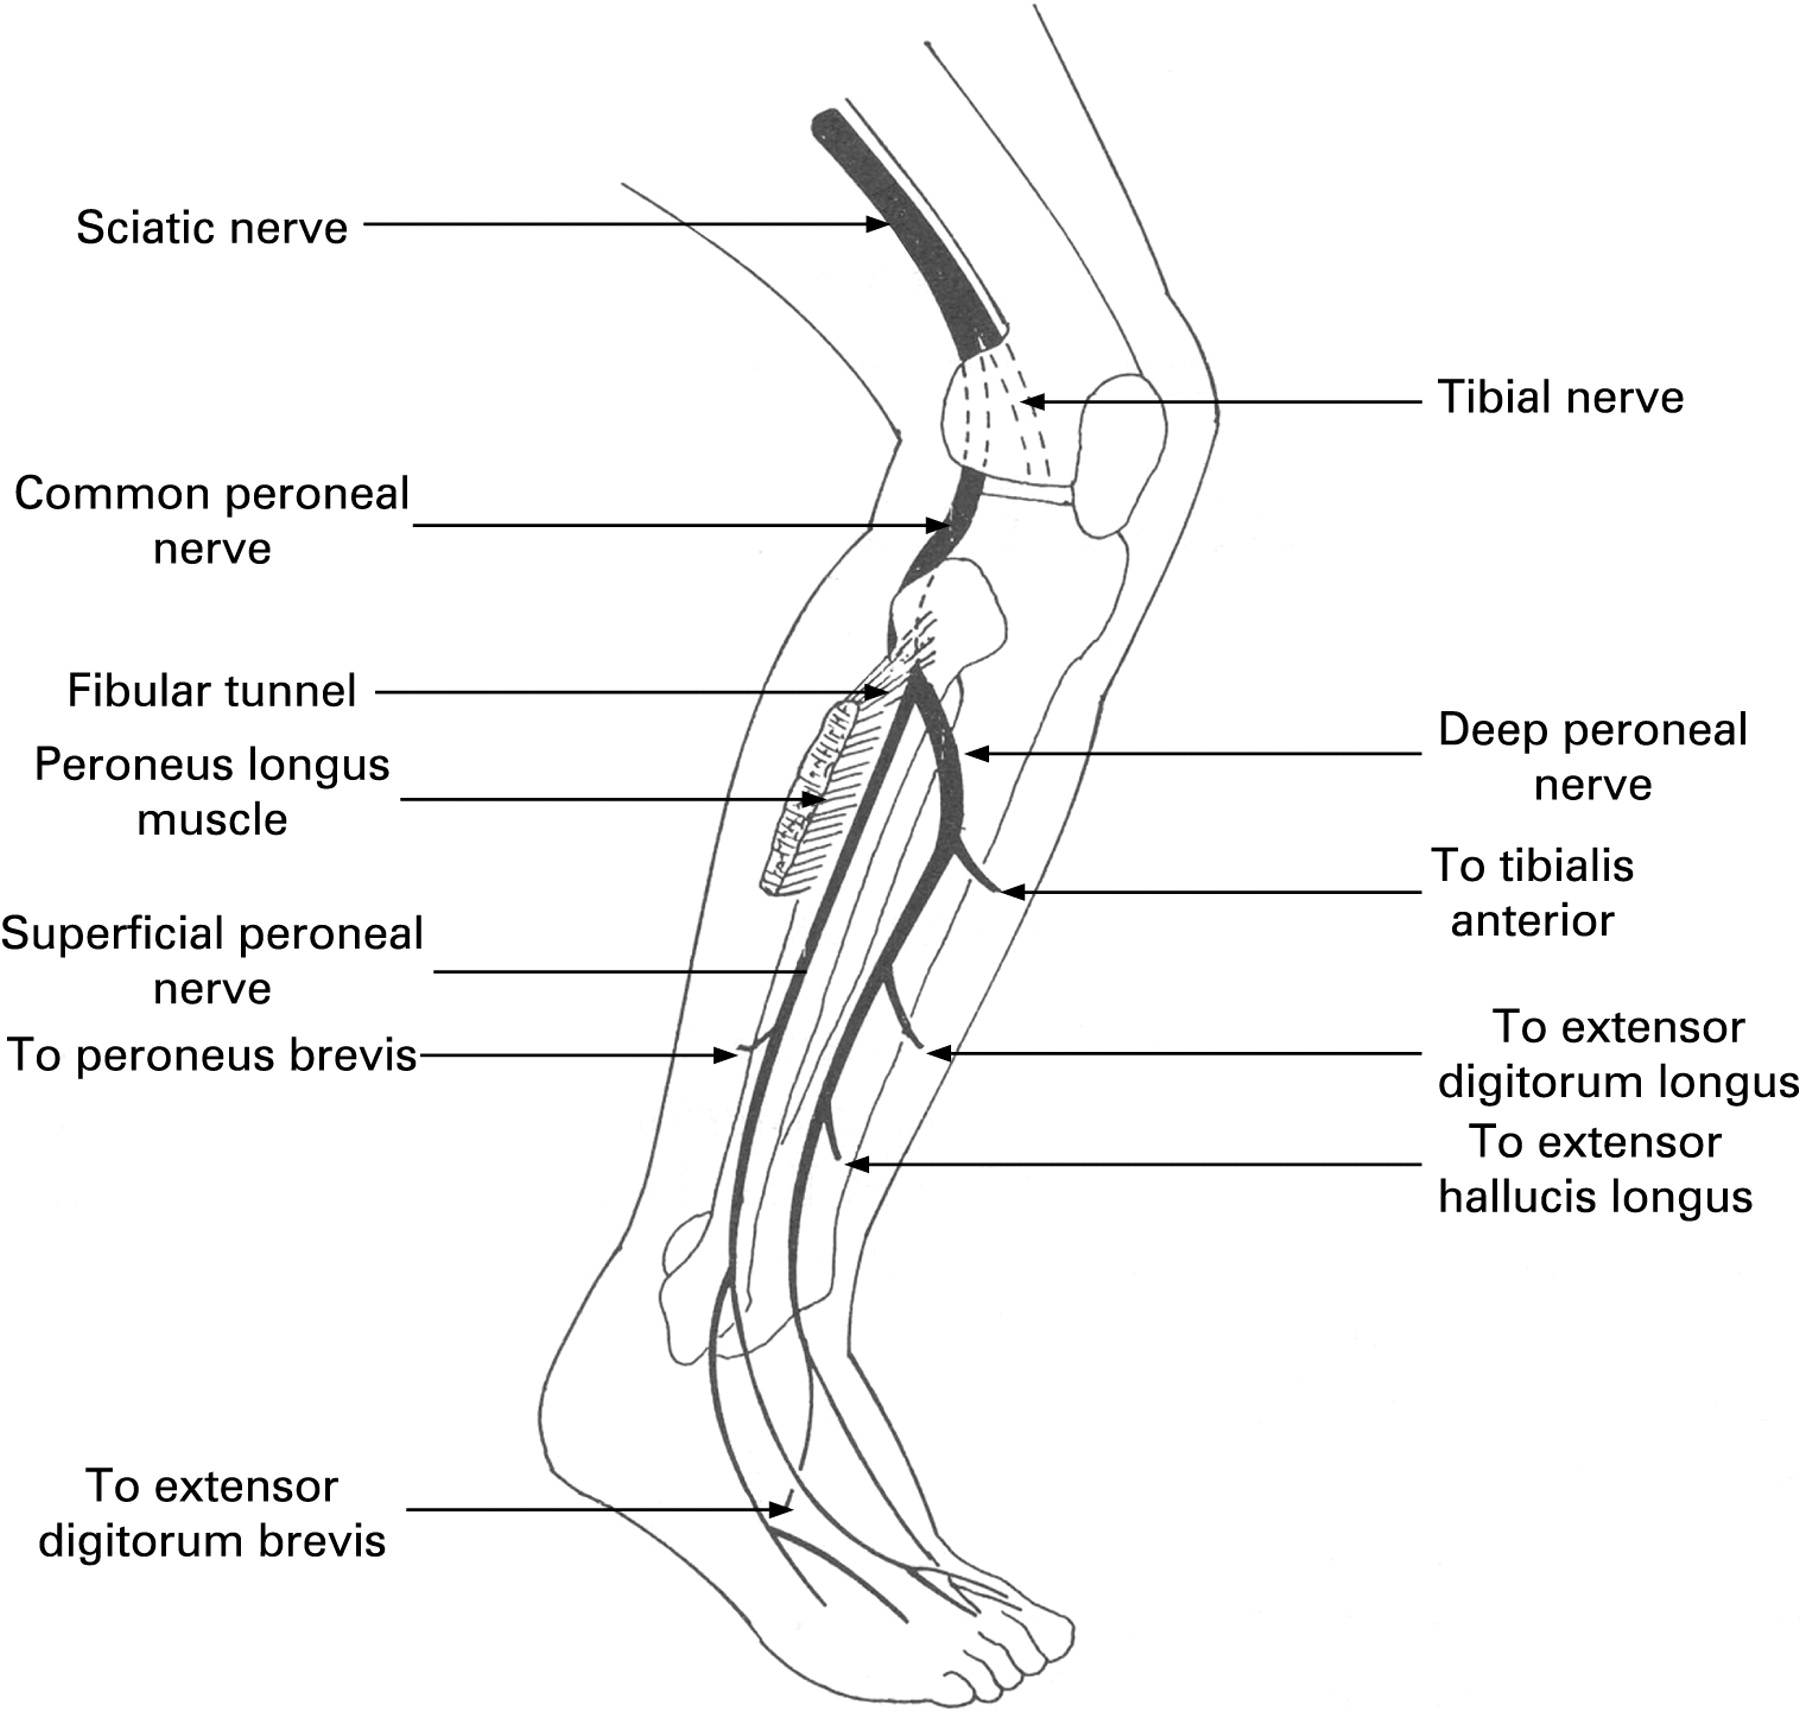 diagram of sciatic nerve leg 2006 hummer h3 parts diagrams common peroneal stepwards